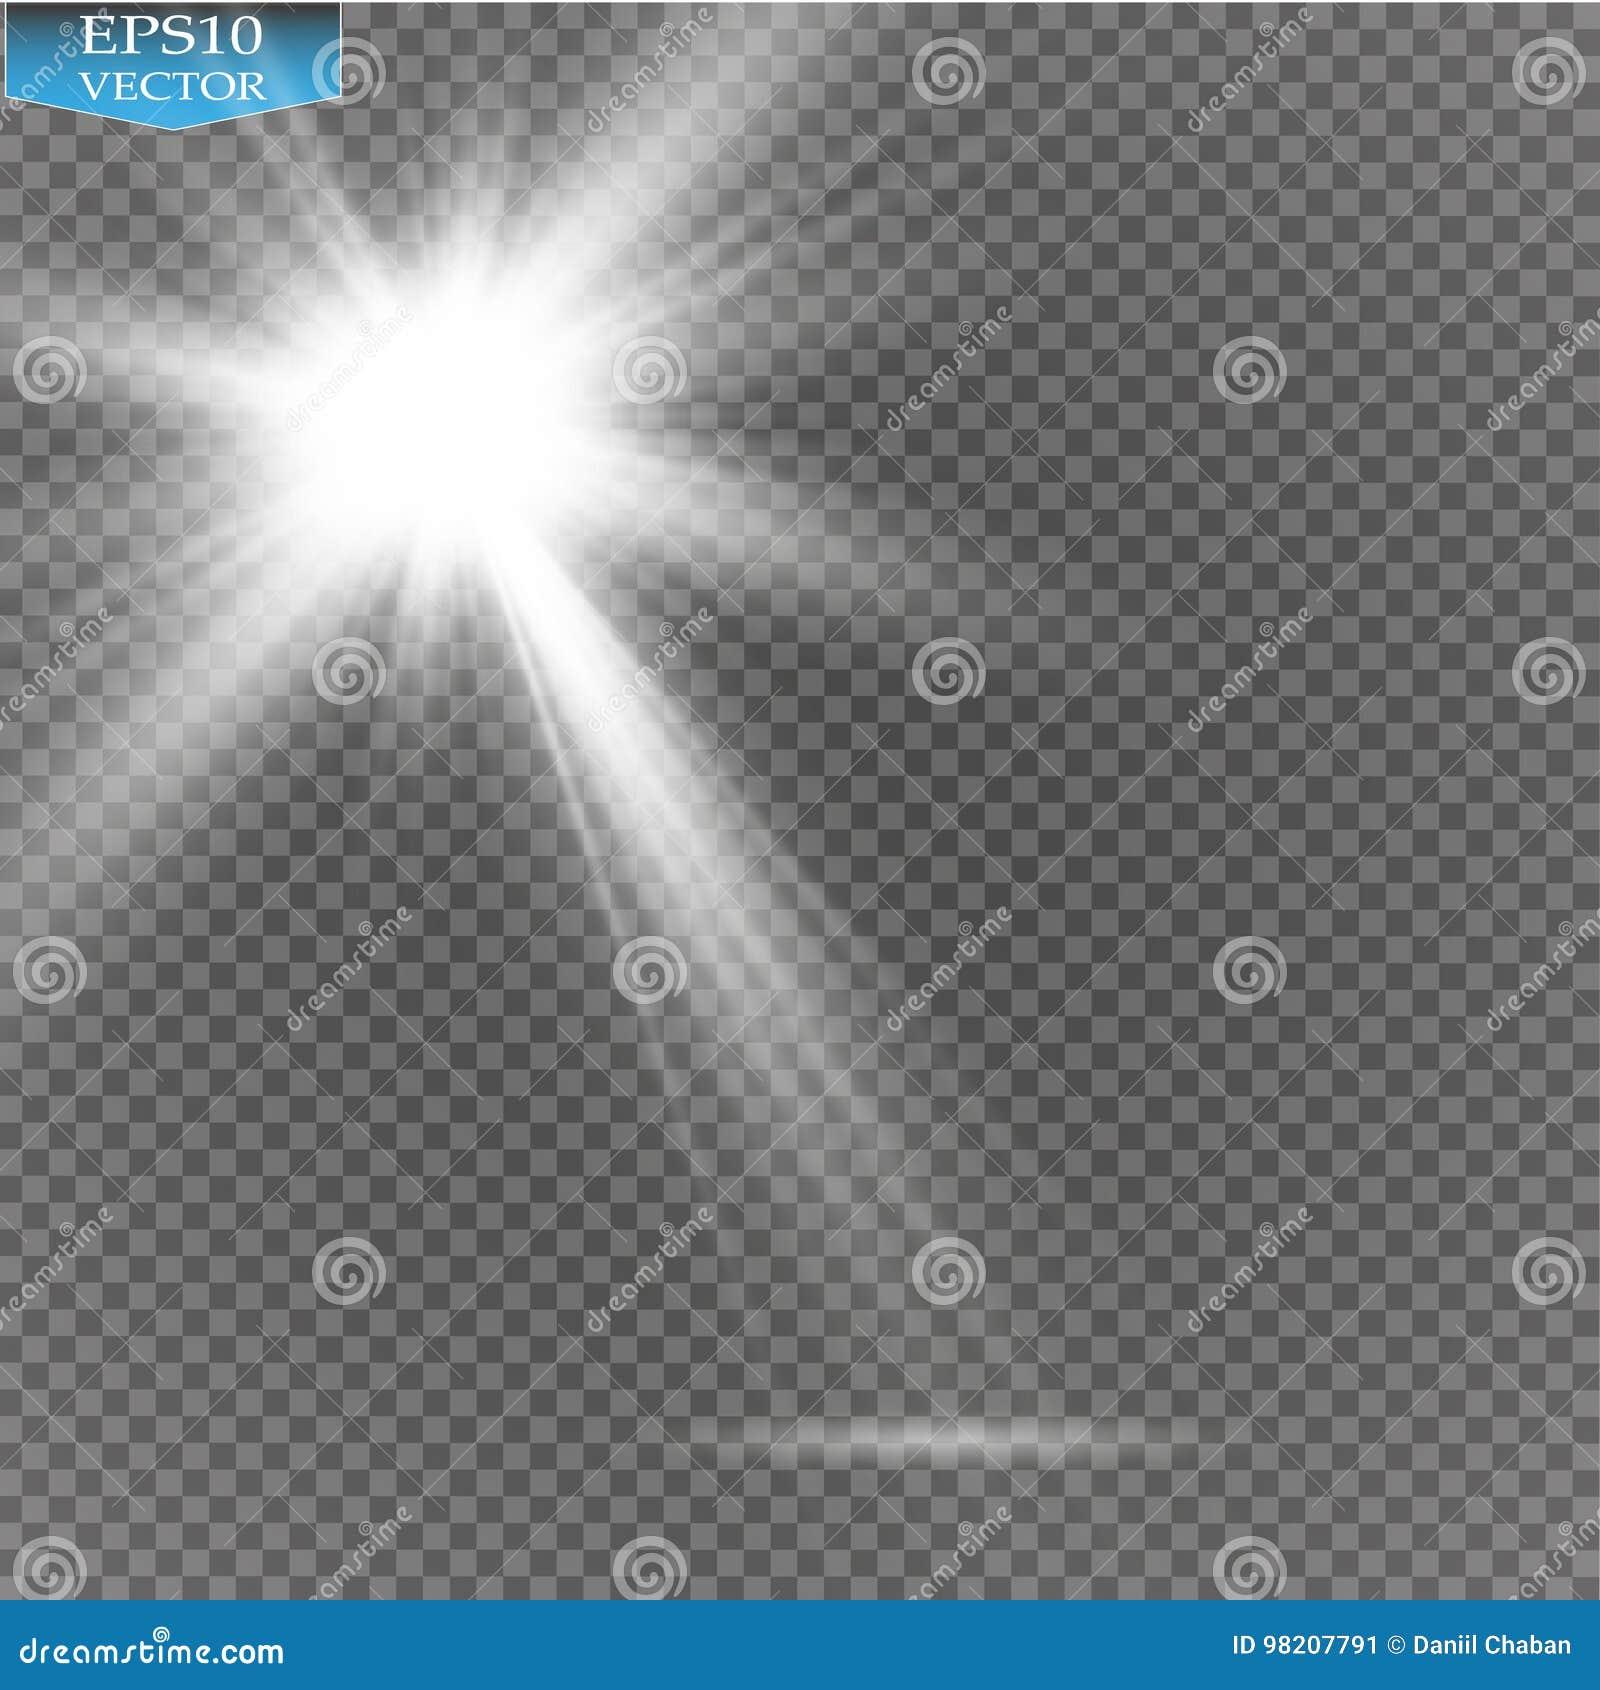 Vector Spotlights. Scene. Light Effects.Vector transparent sunlight special lens flare light effect. Sun flash with rays